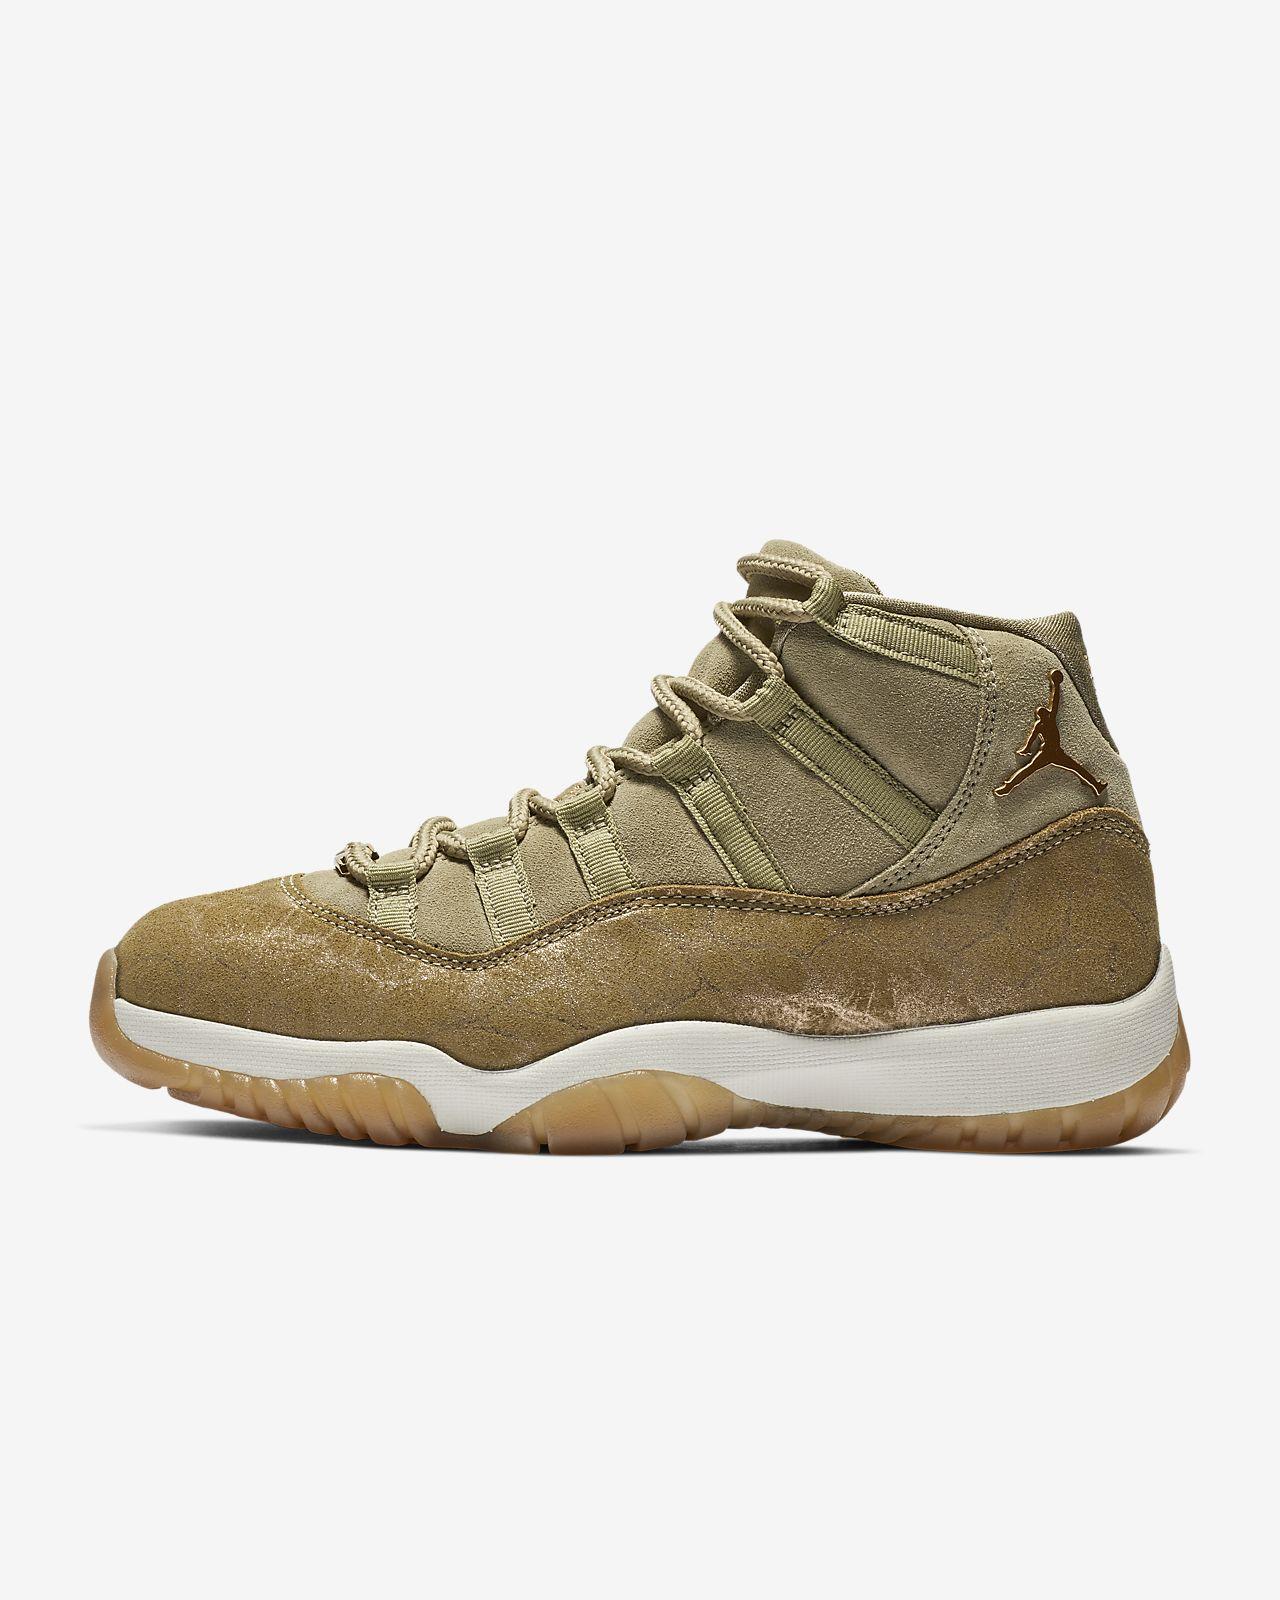 los angeles 967fc 65958 Air Jordan 11 Retro Women's Shoe